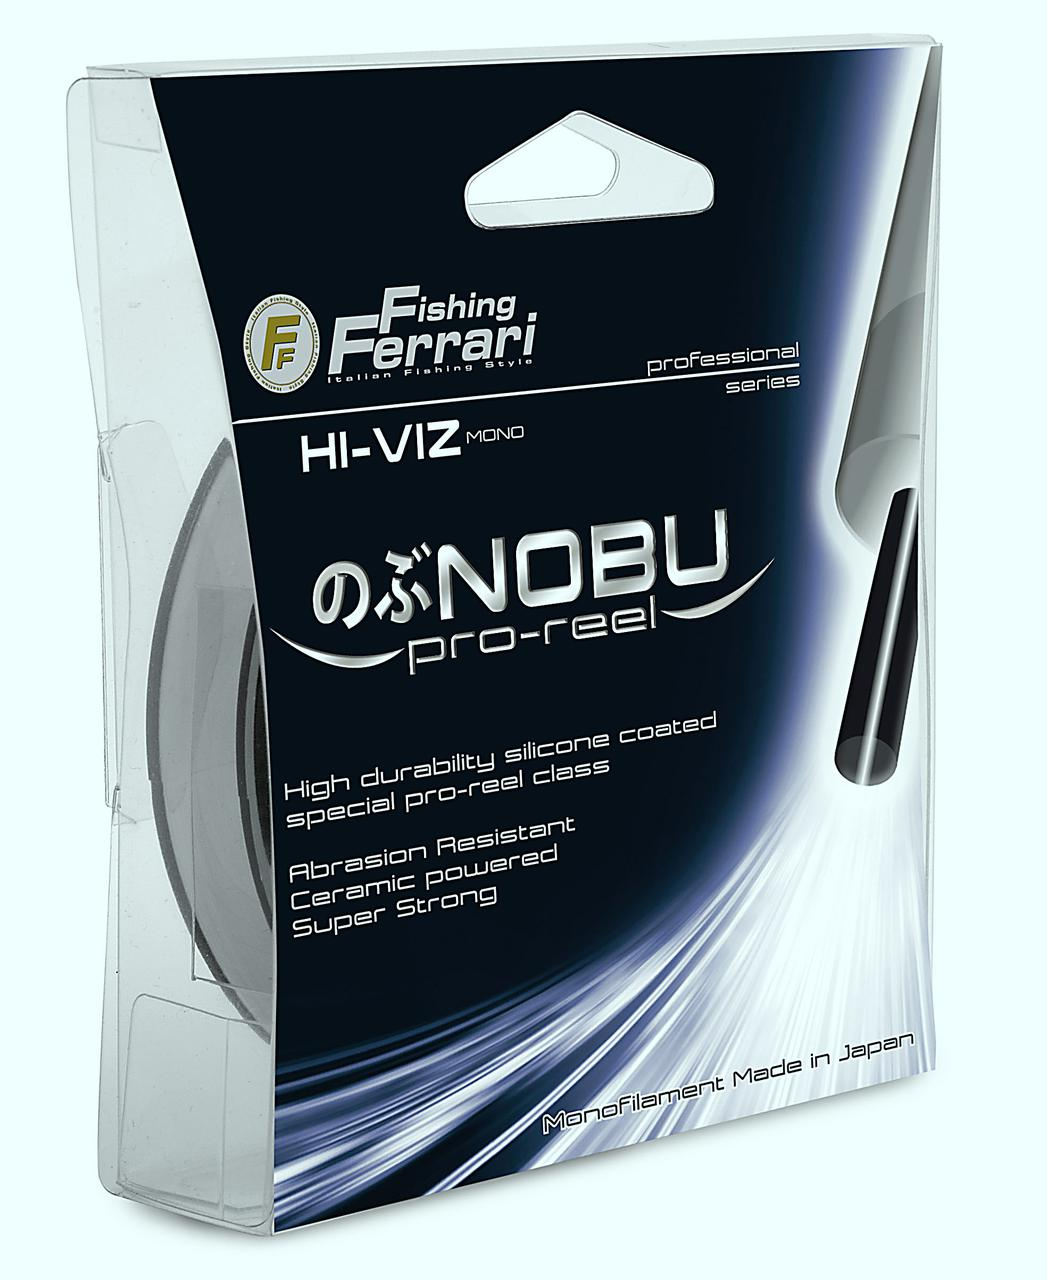 Леска Lineaeffe FF NOBU  Pro Reel 0.40мм 150м. FishTest-20,00кг Sand Special (серый)  Made in Japan